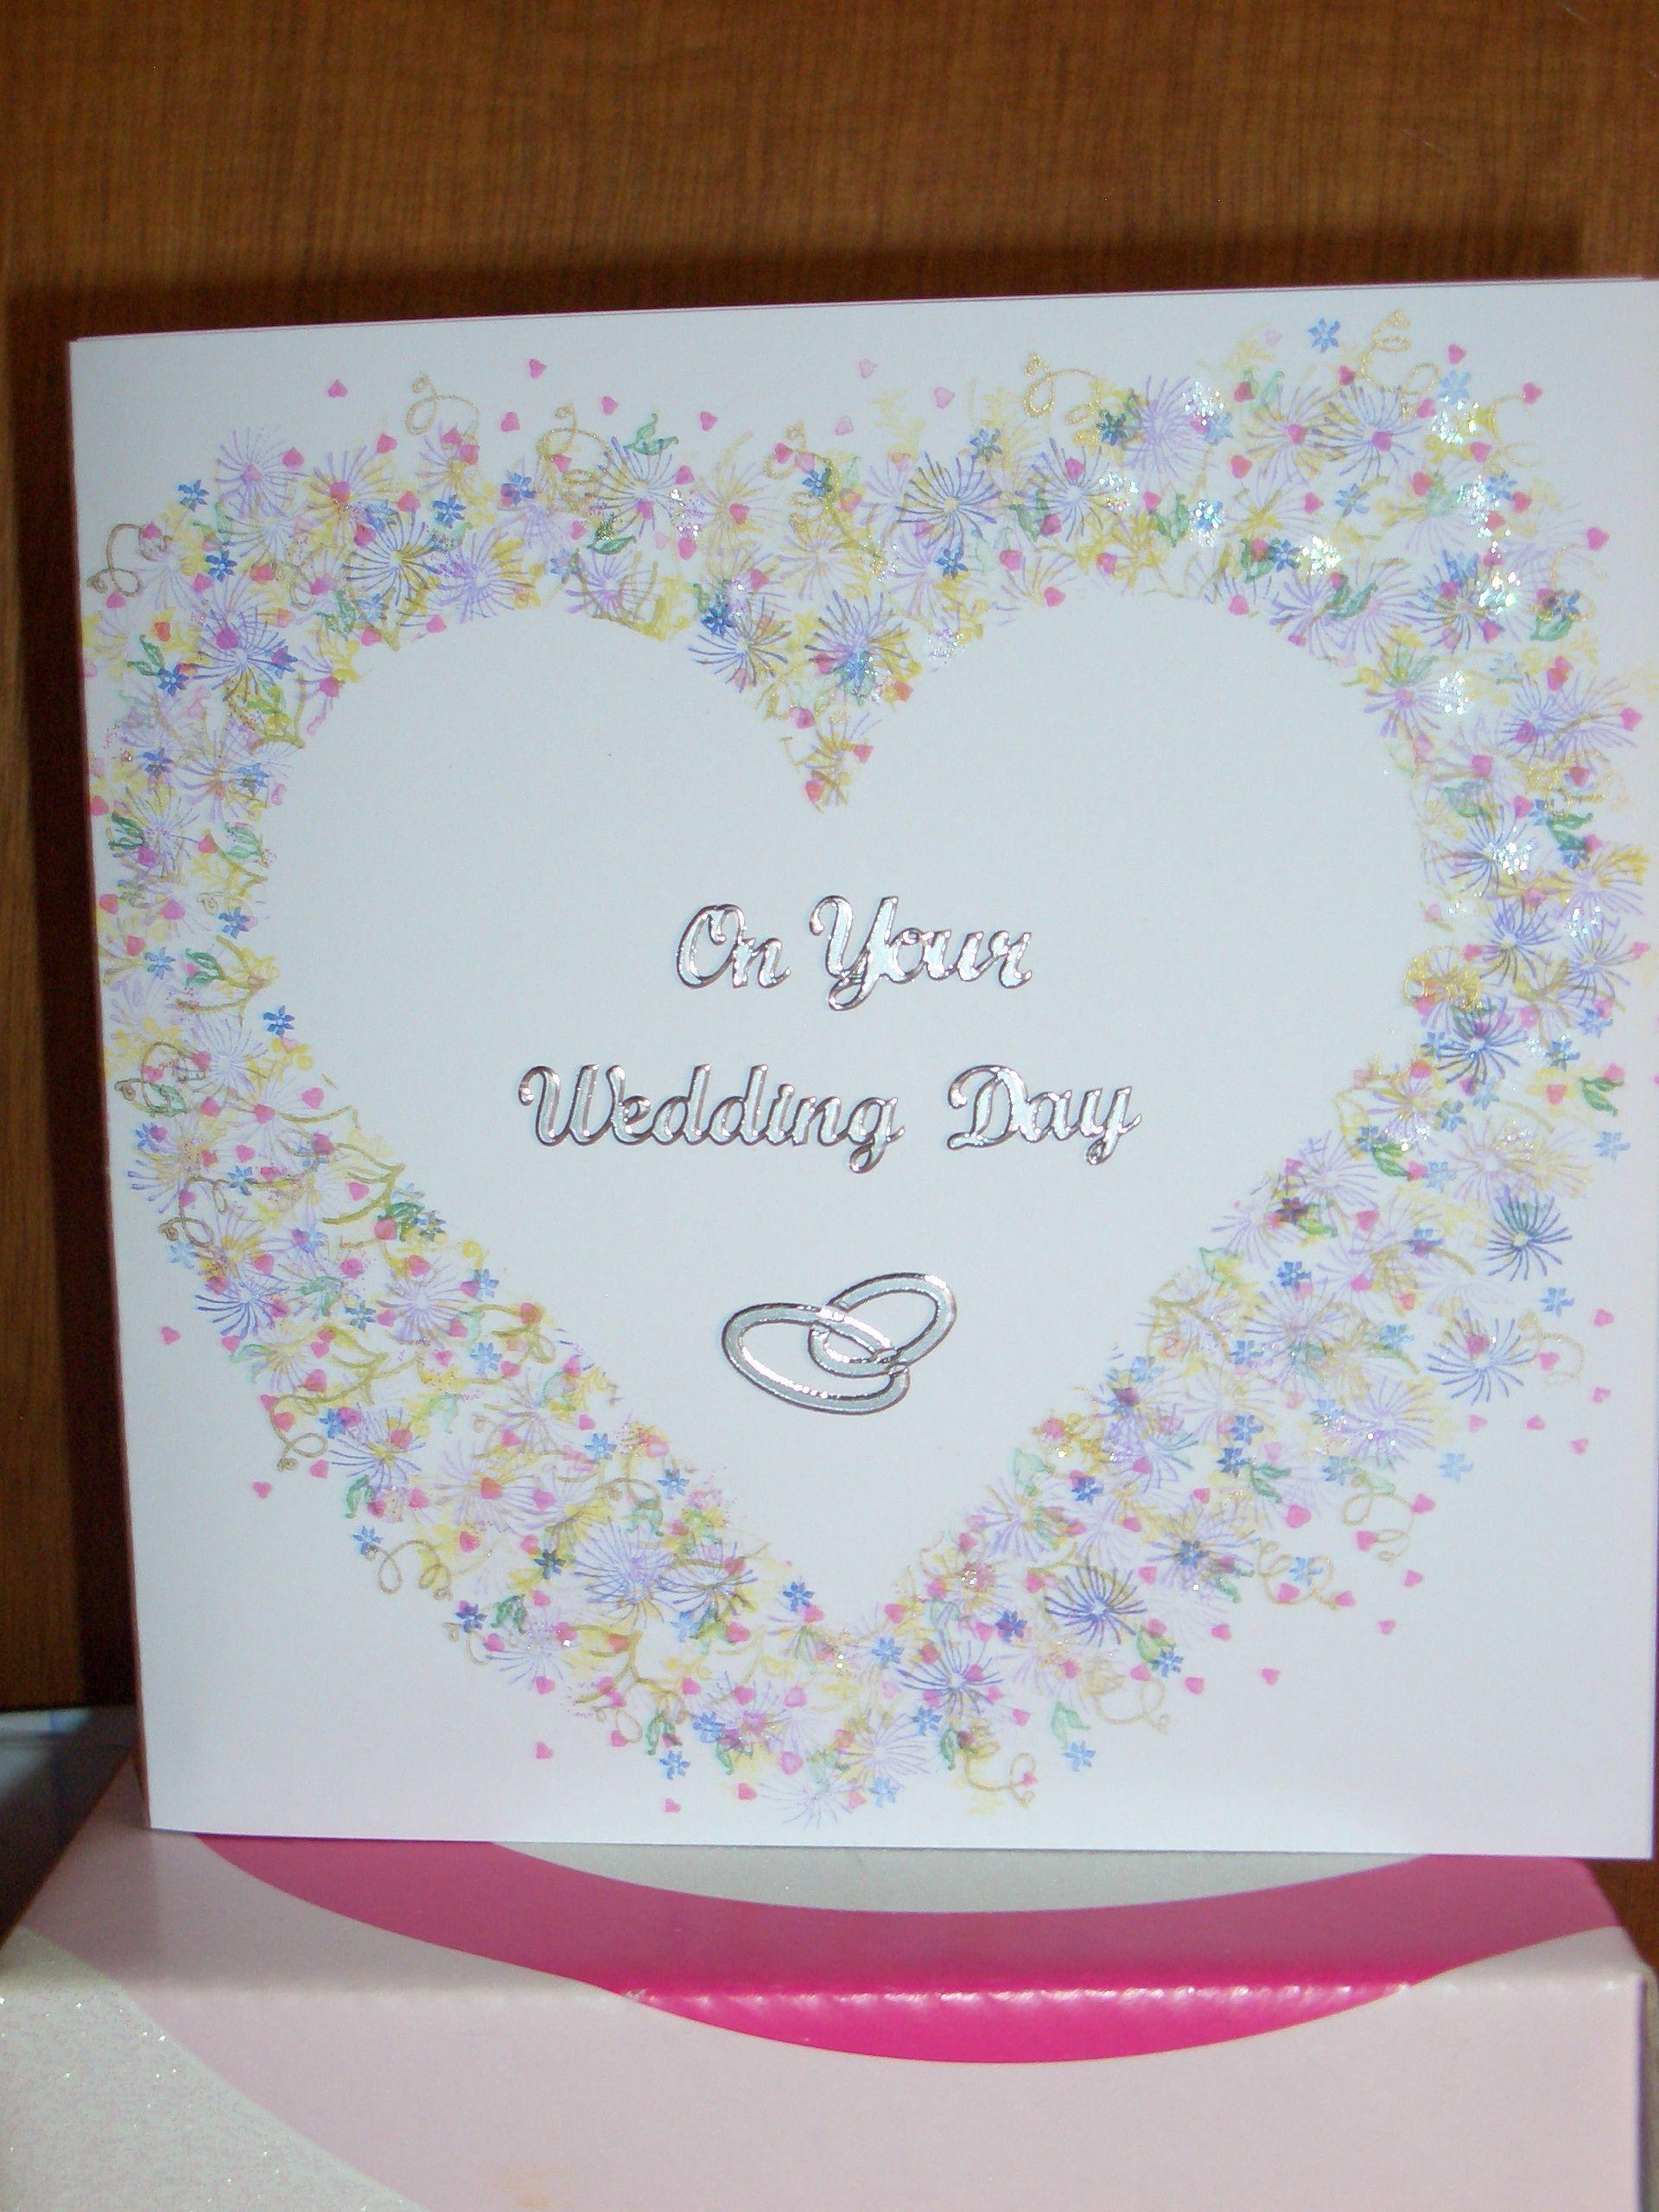 Wedding Card using Peg Stamps & Peel-offs